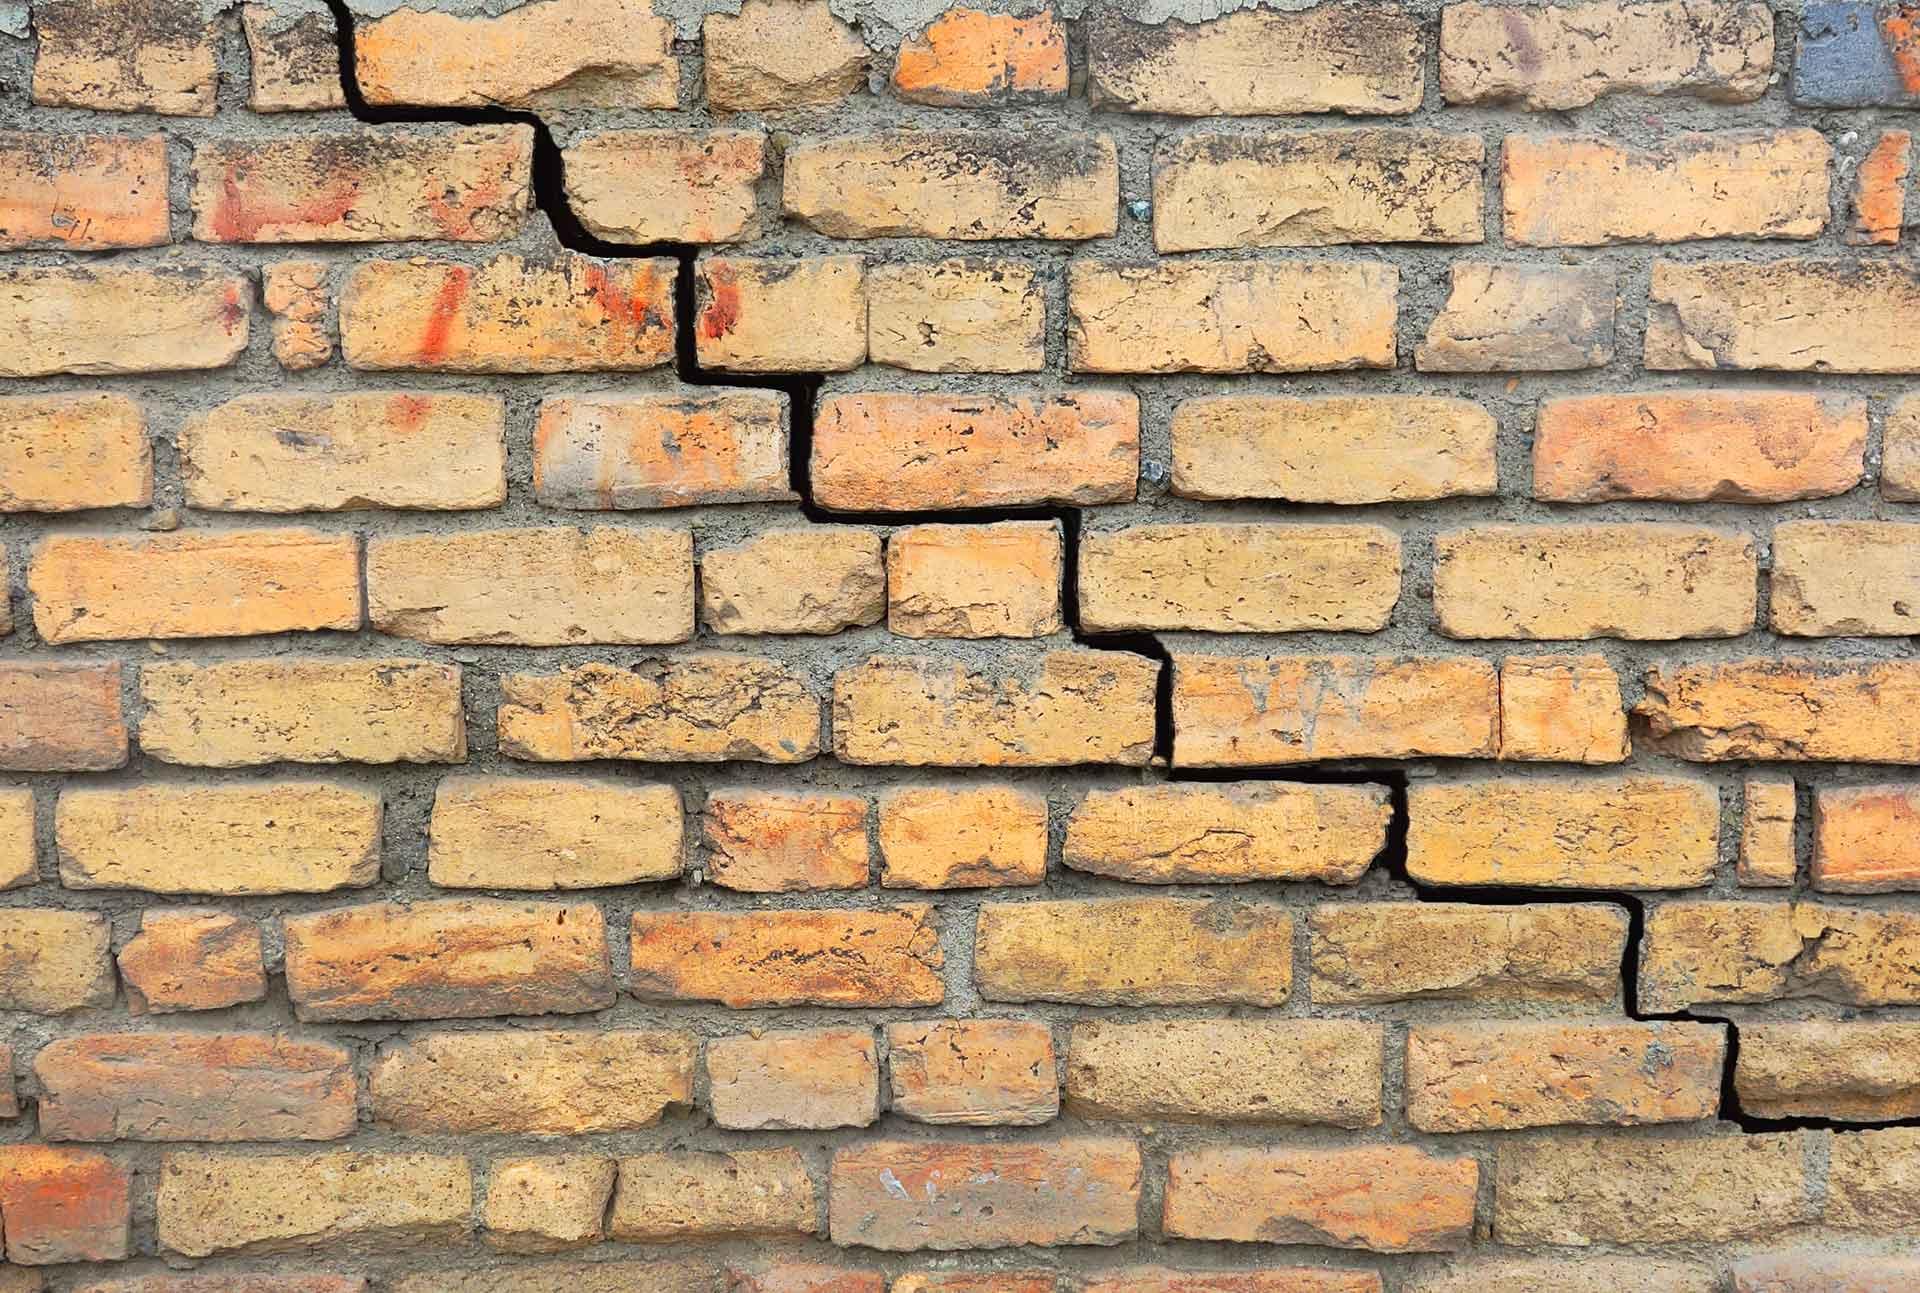 Cracked Exterior Brick